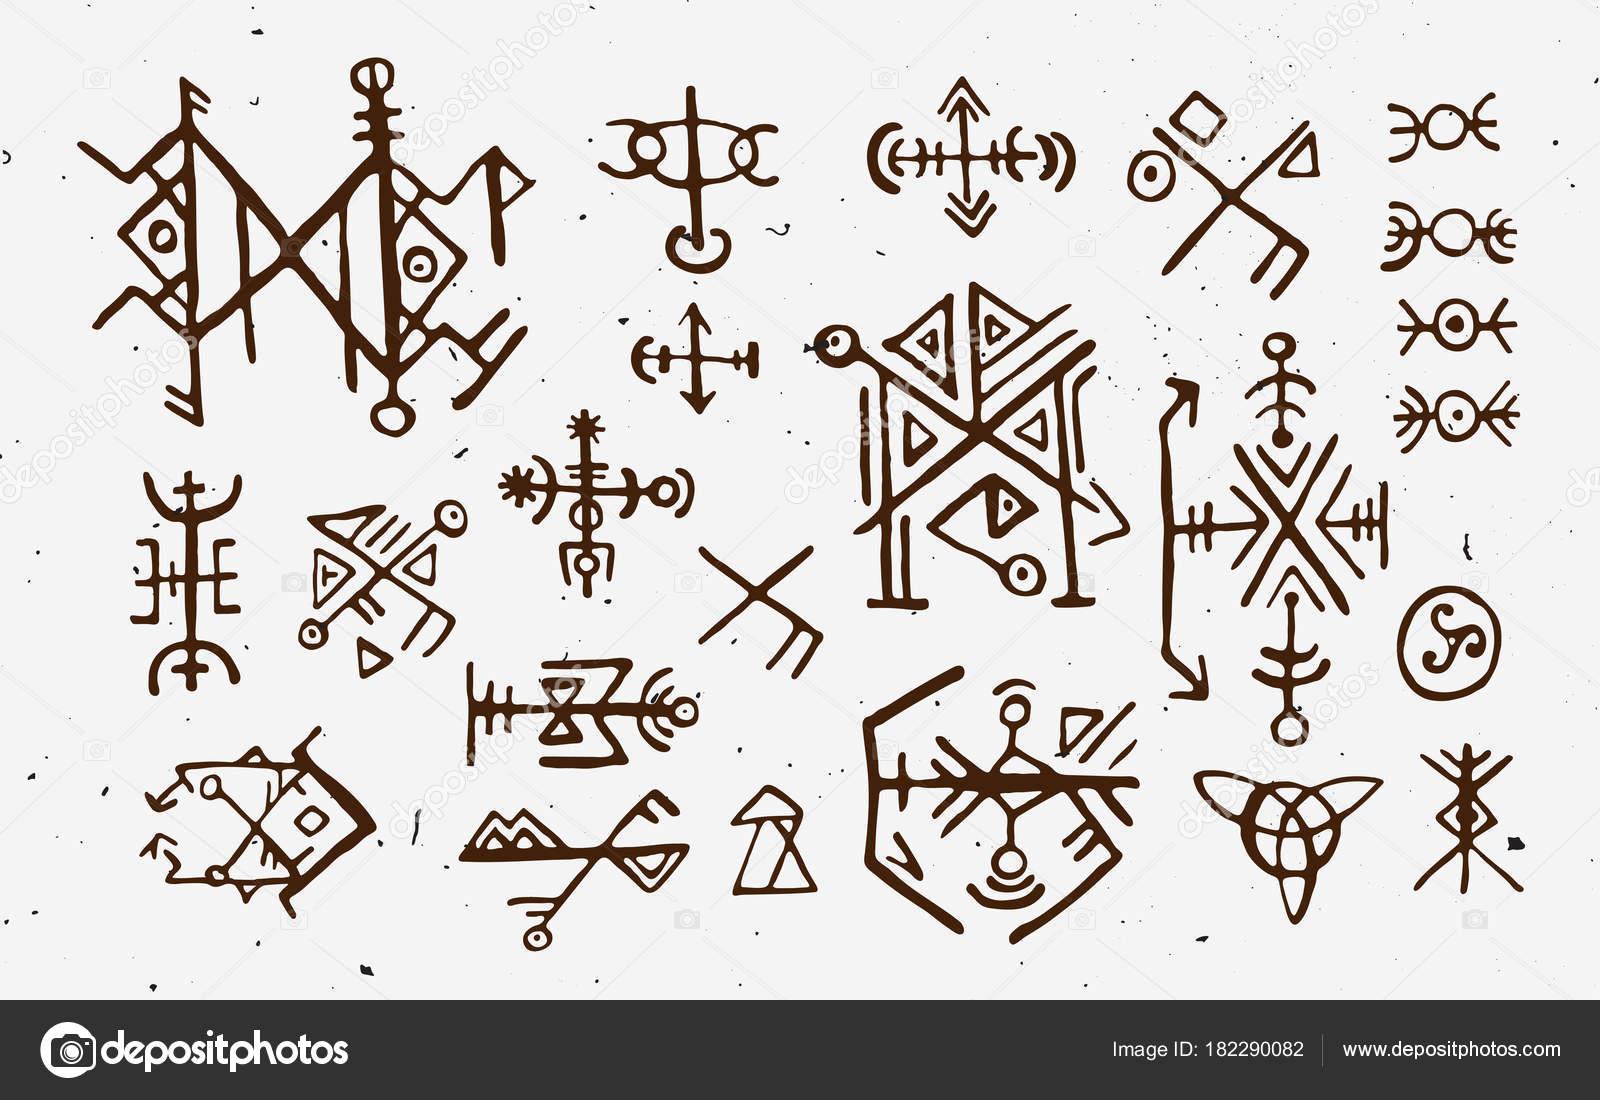 Futhark norse islandic and viking runes set magic hand draw symbols futhark norse islandic and viking runes set magic hand draw symbols as scripted talismans vector set of ancient runes of iceland buycottarizona Choice Image